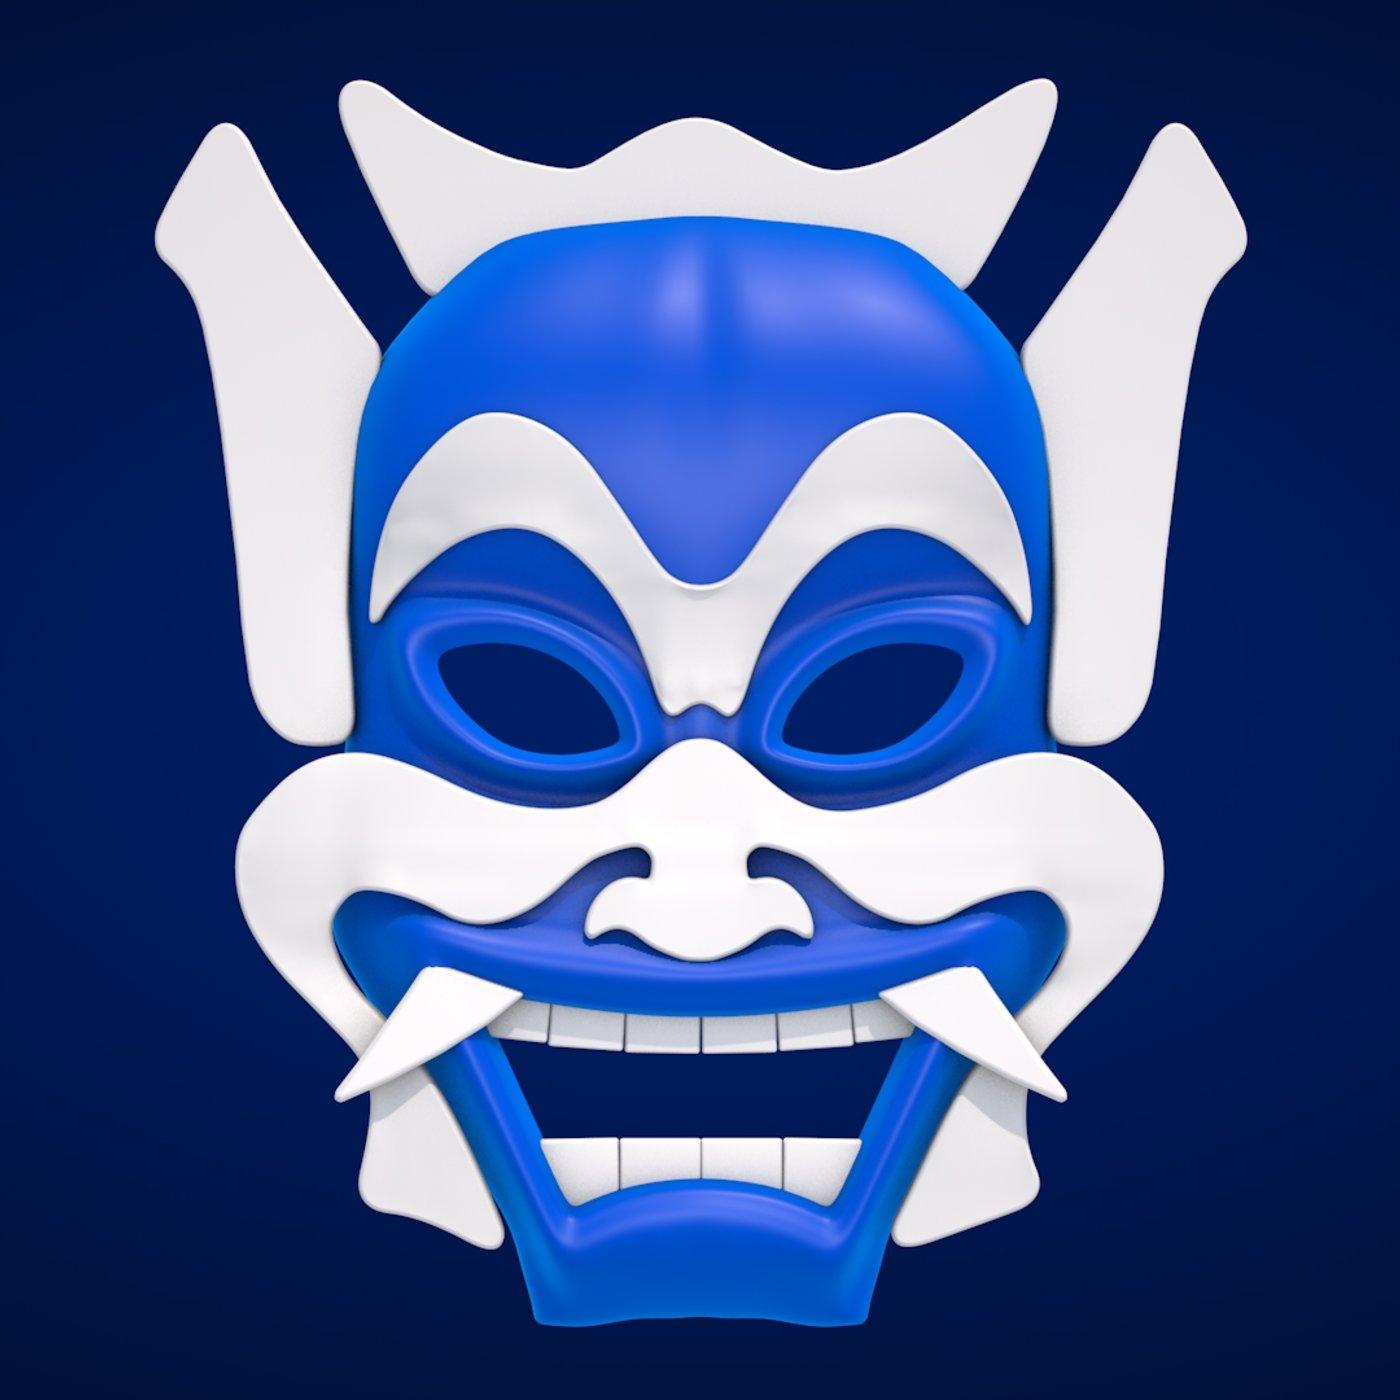 The Blue Spirit